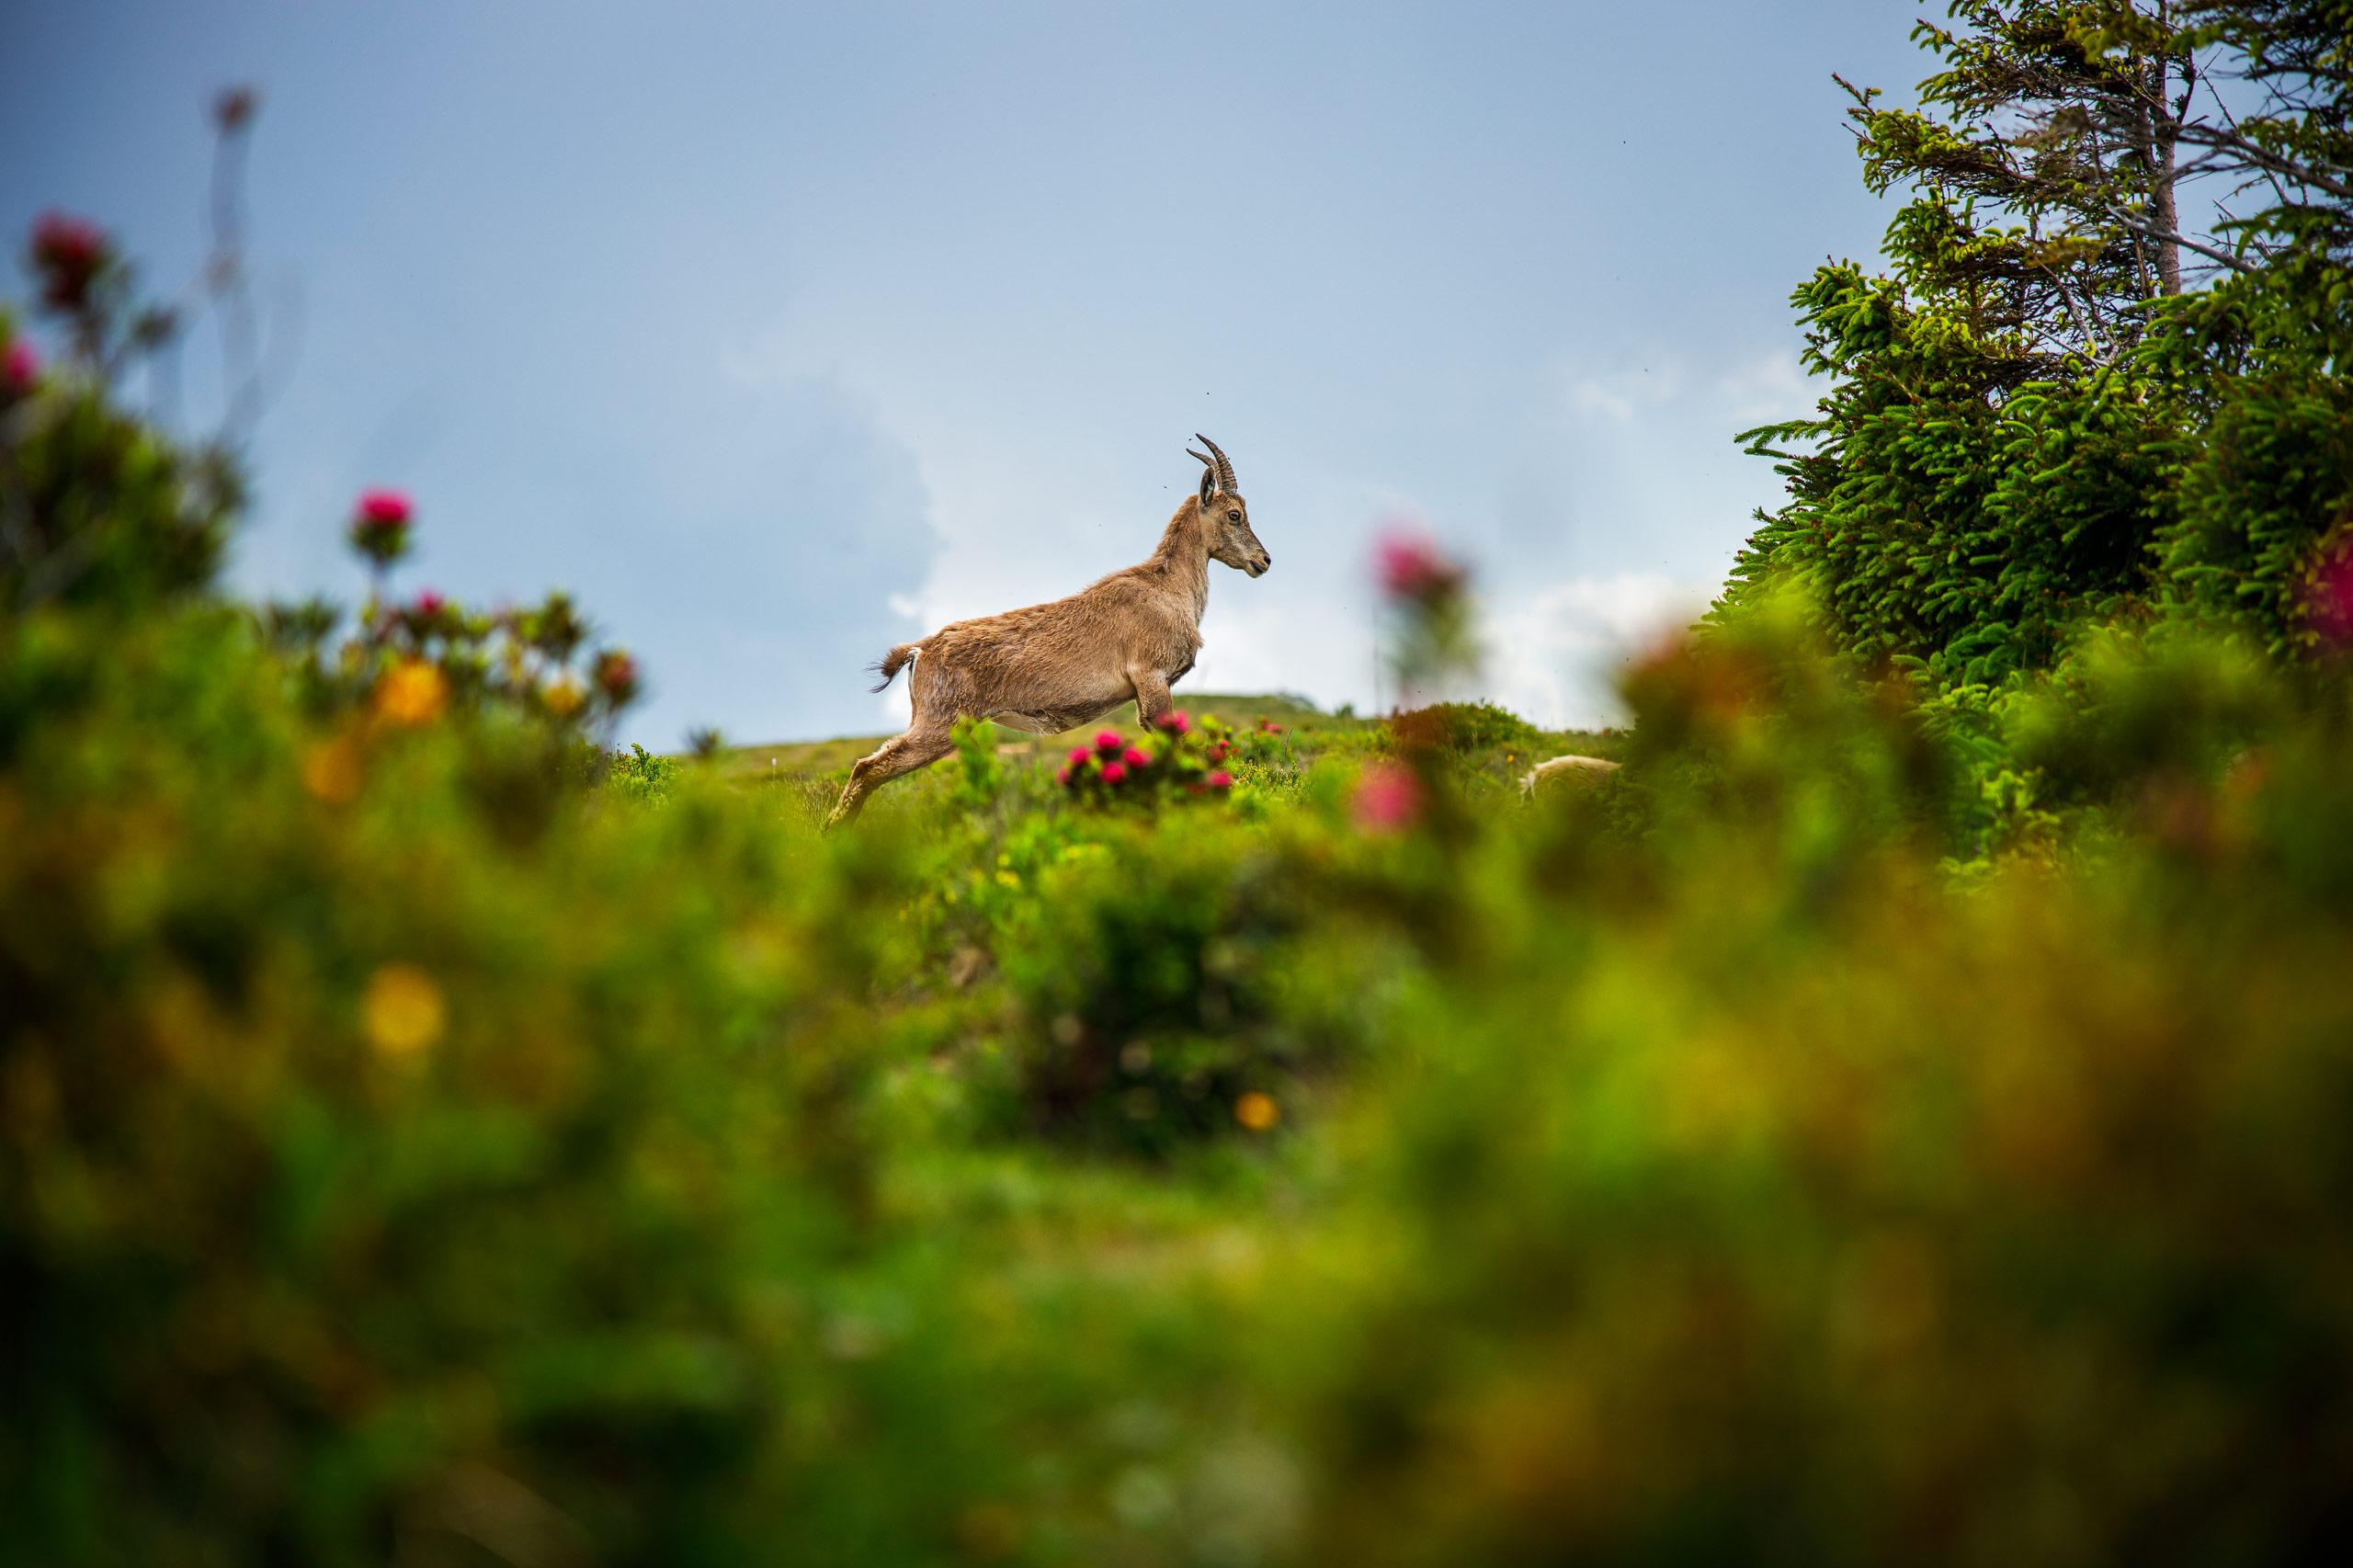 Tom_Schueler_Fotografie_Wildlife_Mammals_8